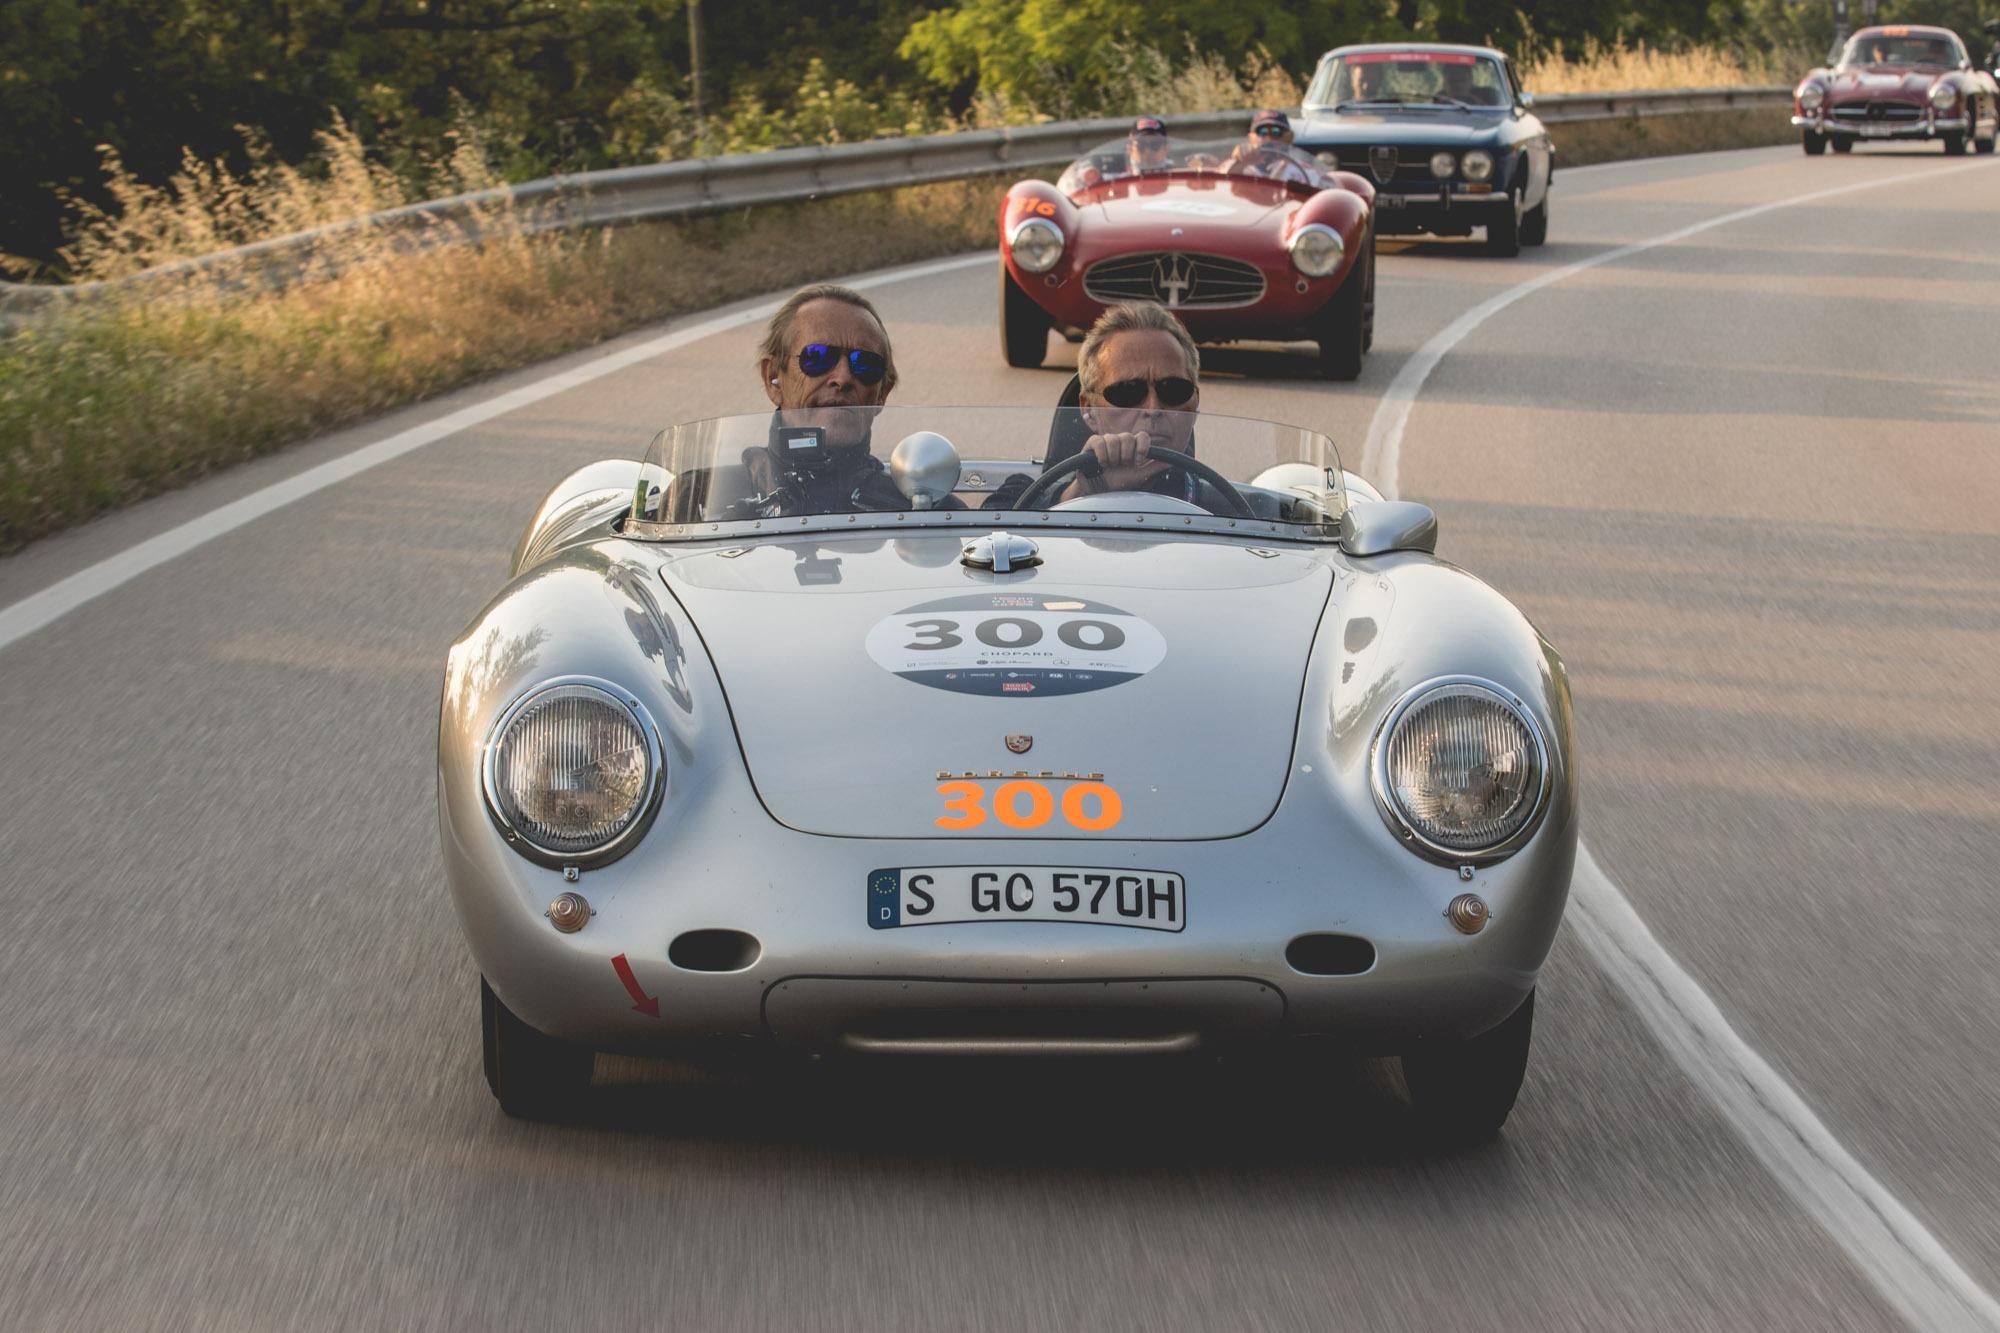 Mille Miglia - Karl-Friedrich Scheufele et Jacky Ickx